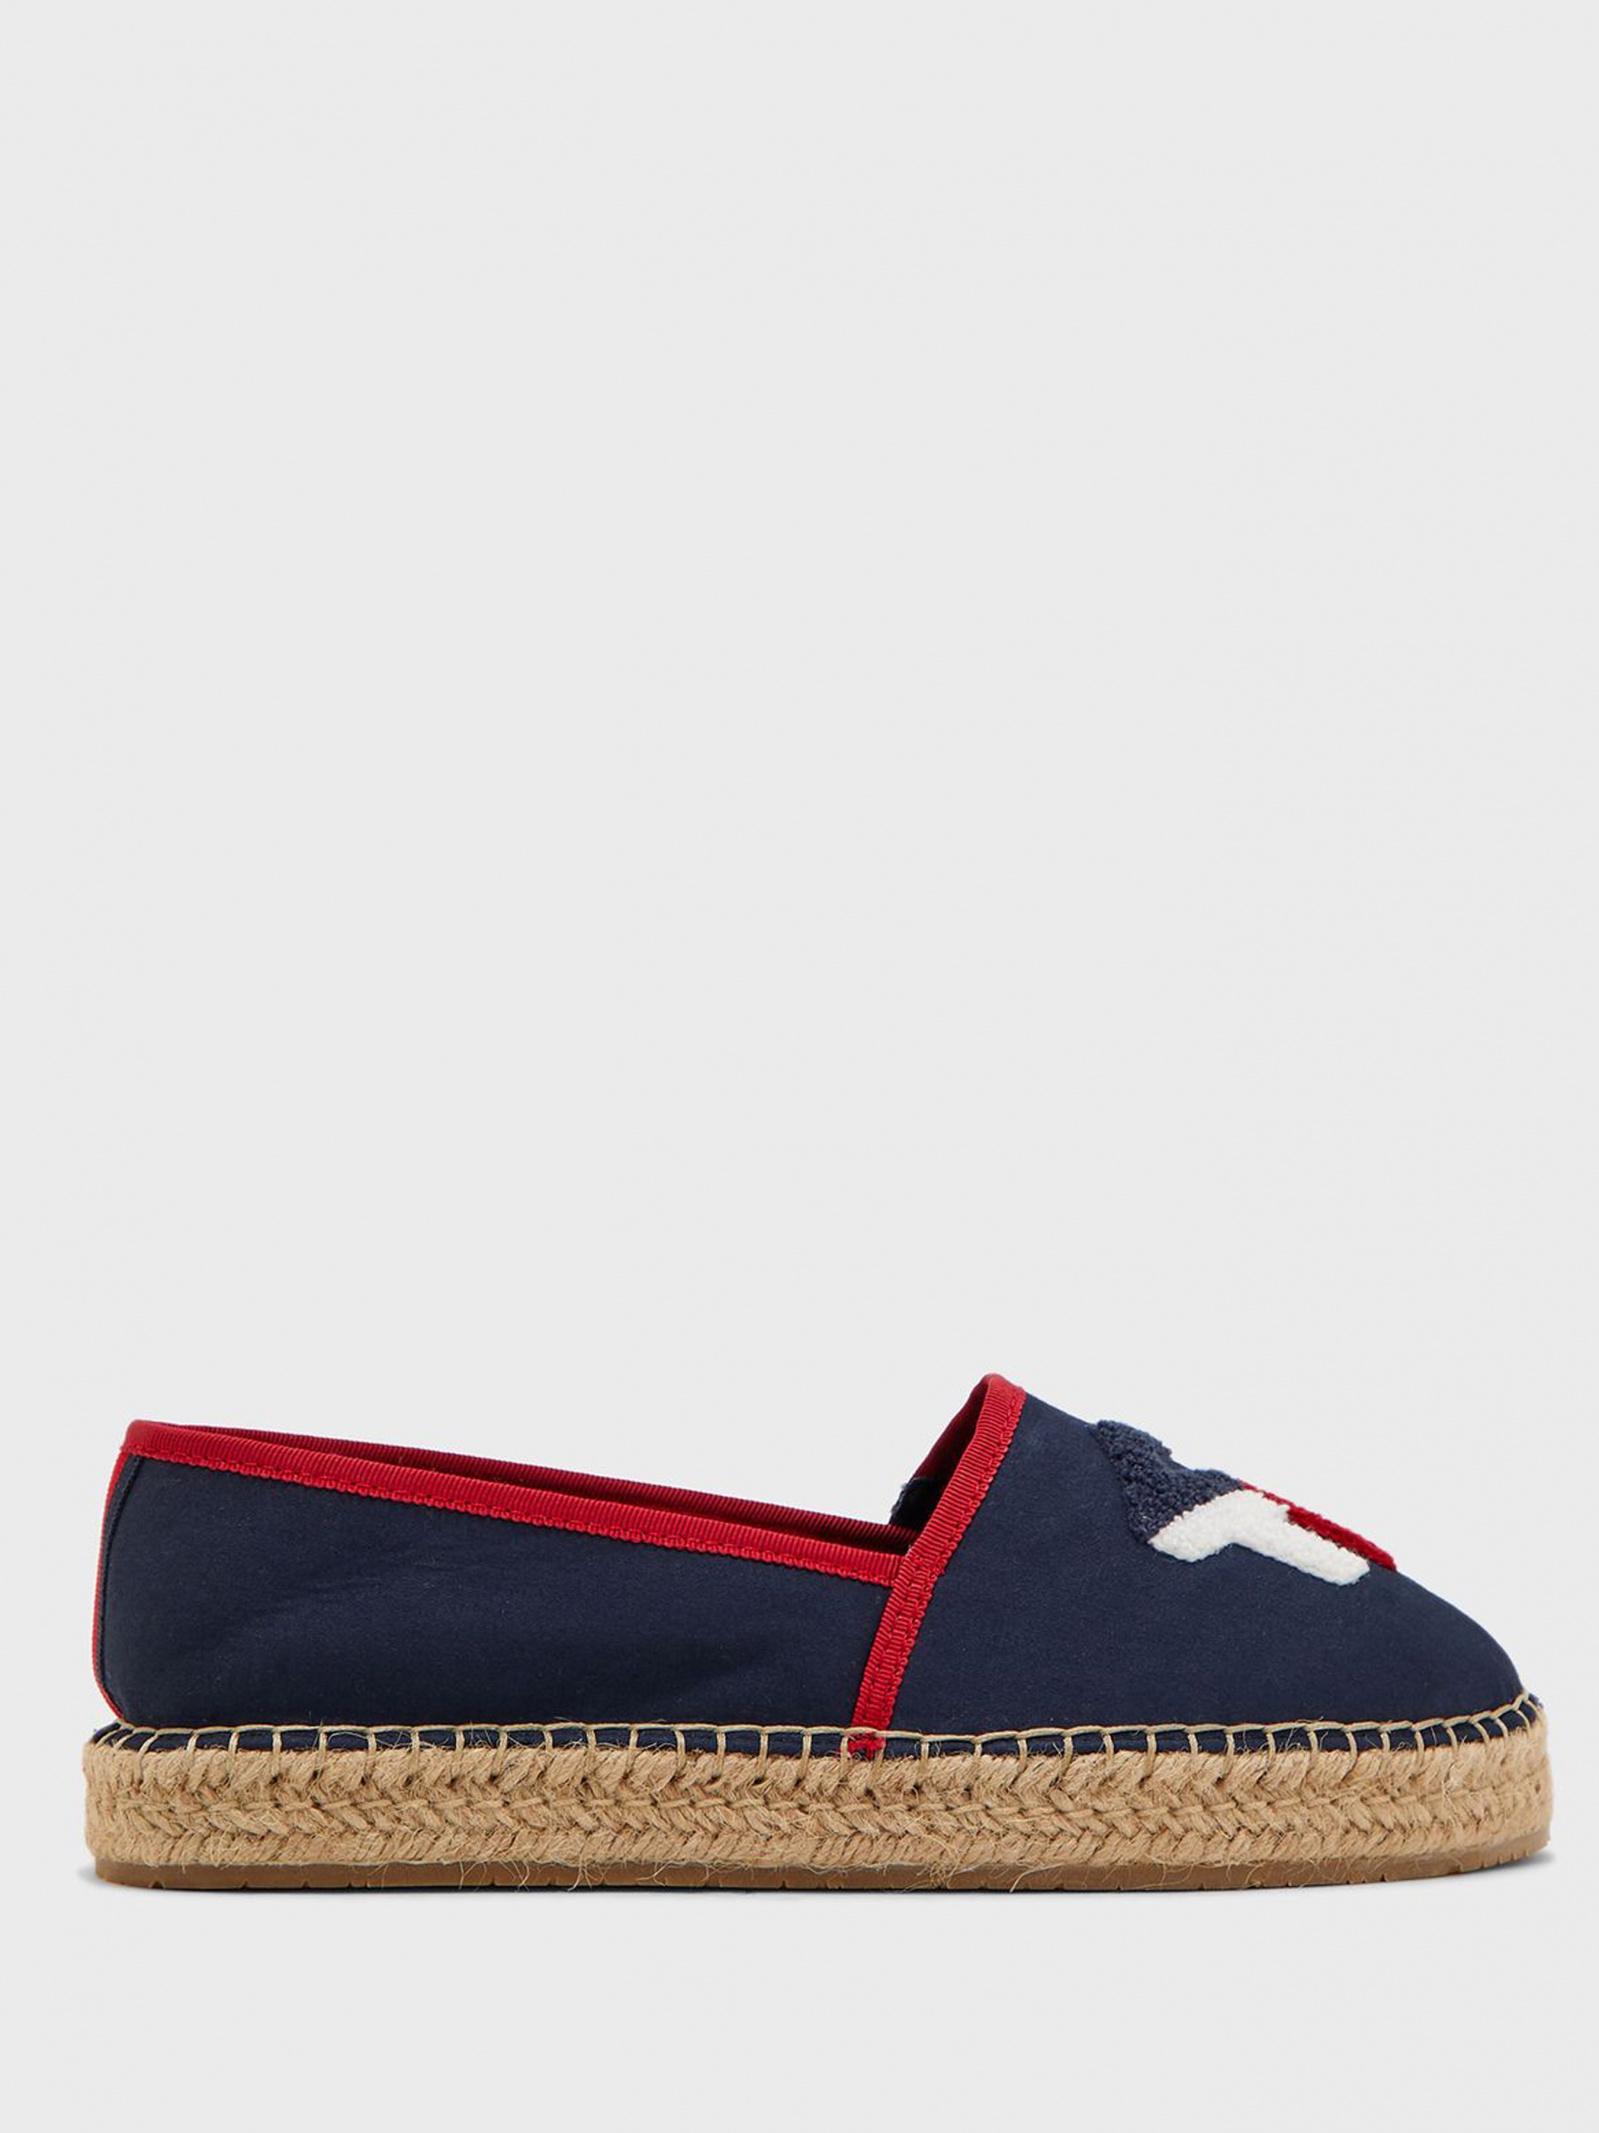 Балетки женские Tommy Hilfiger TH TD1438 брендовая обувь, 2017